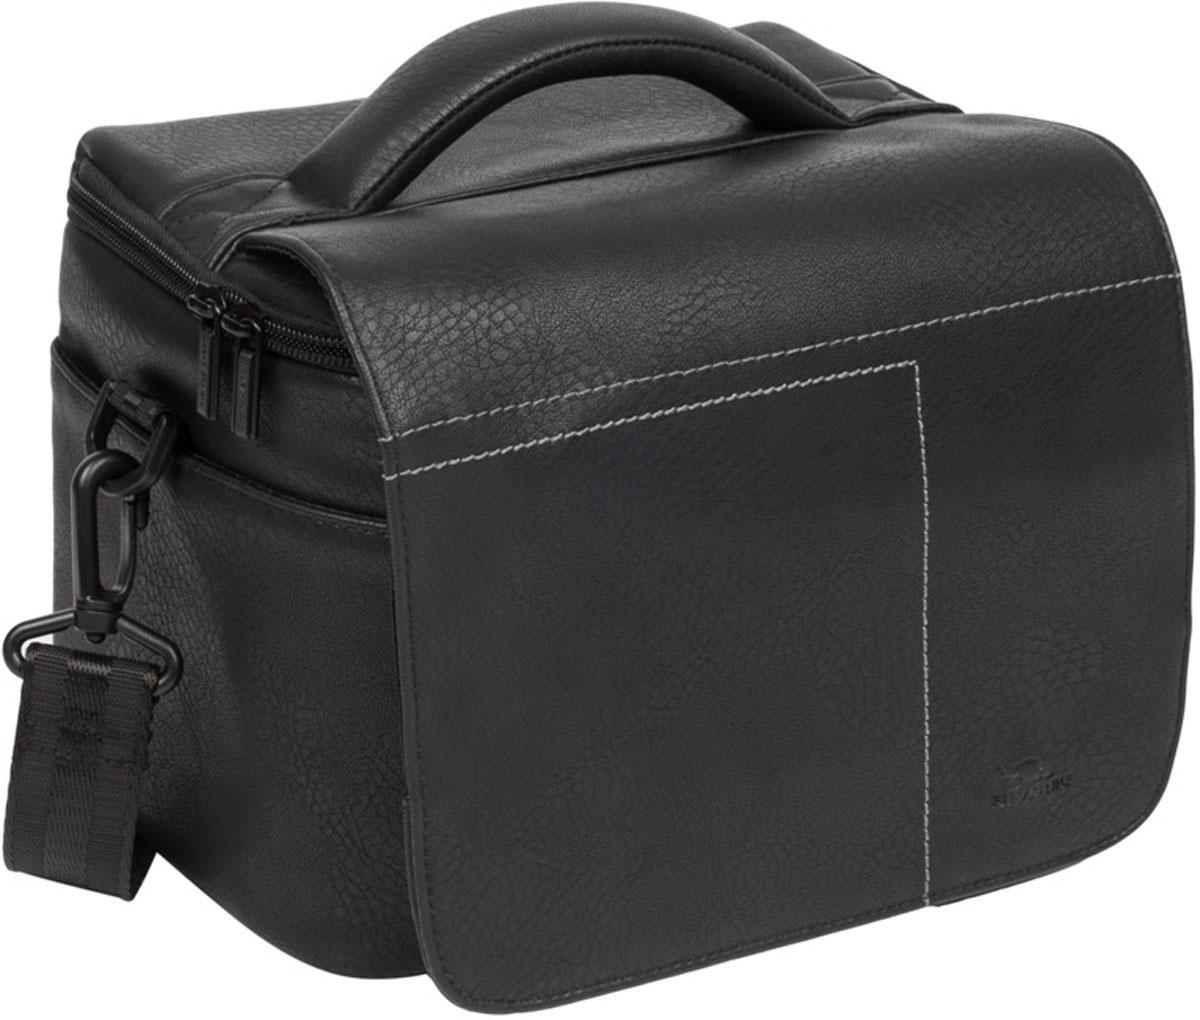 Riva 7613 SLR Case, Black сумка для зеркальной фотокамеры